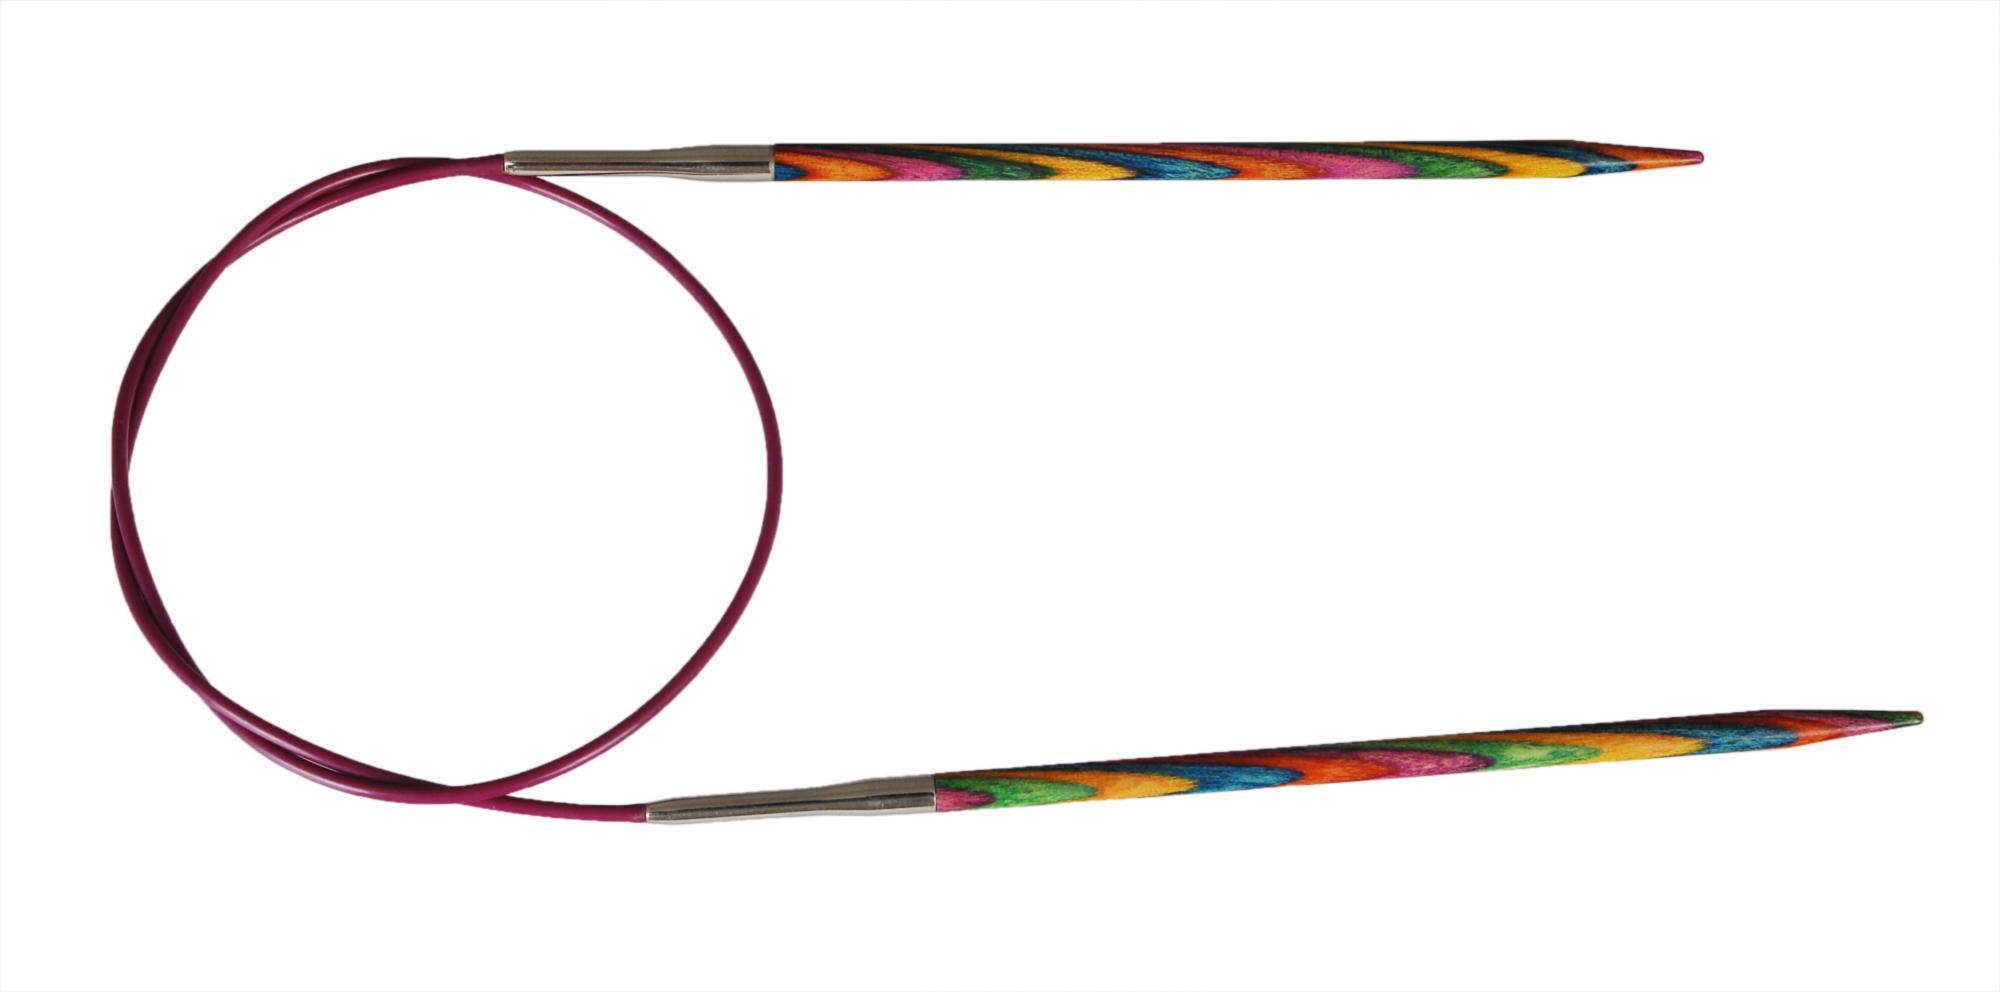 Спицы круговые 50 см Symfonie Wood KnitPro, 20394, 6.00 мм